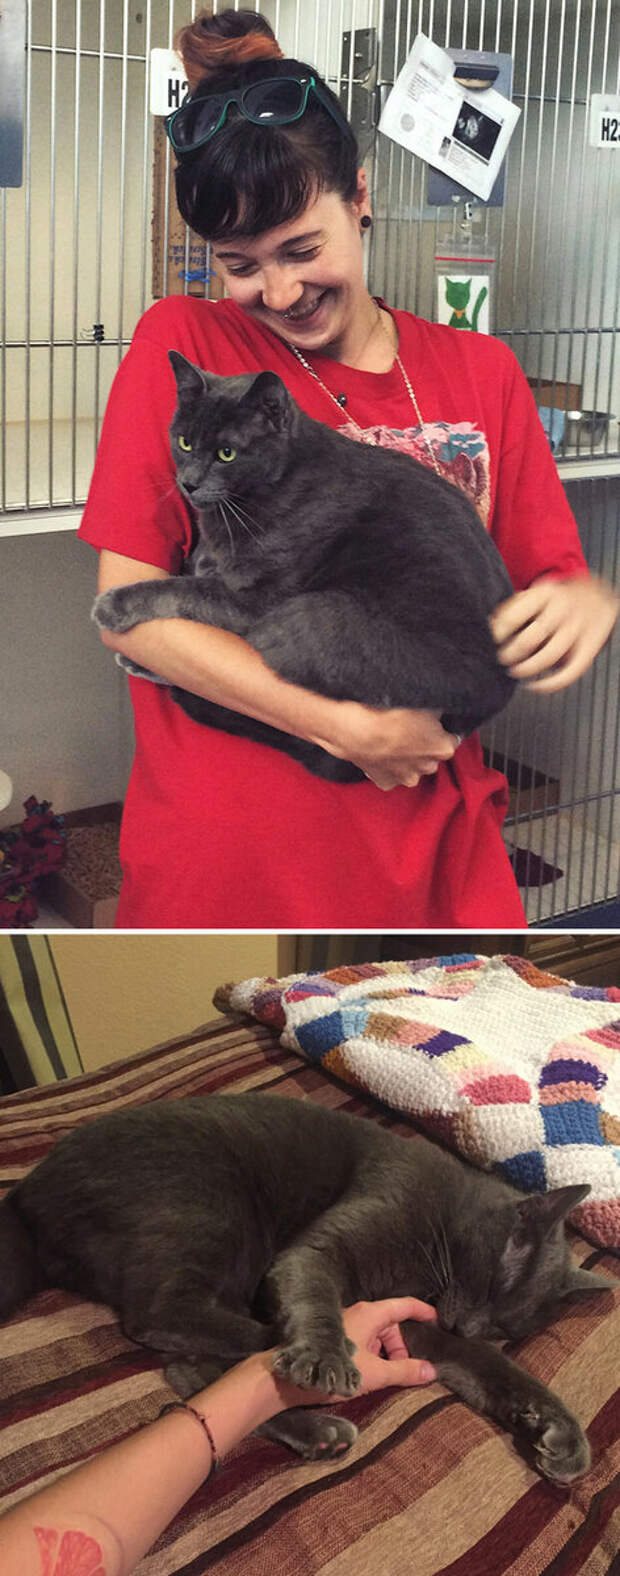 Радости кошки и хозяйки нет предела